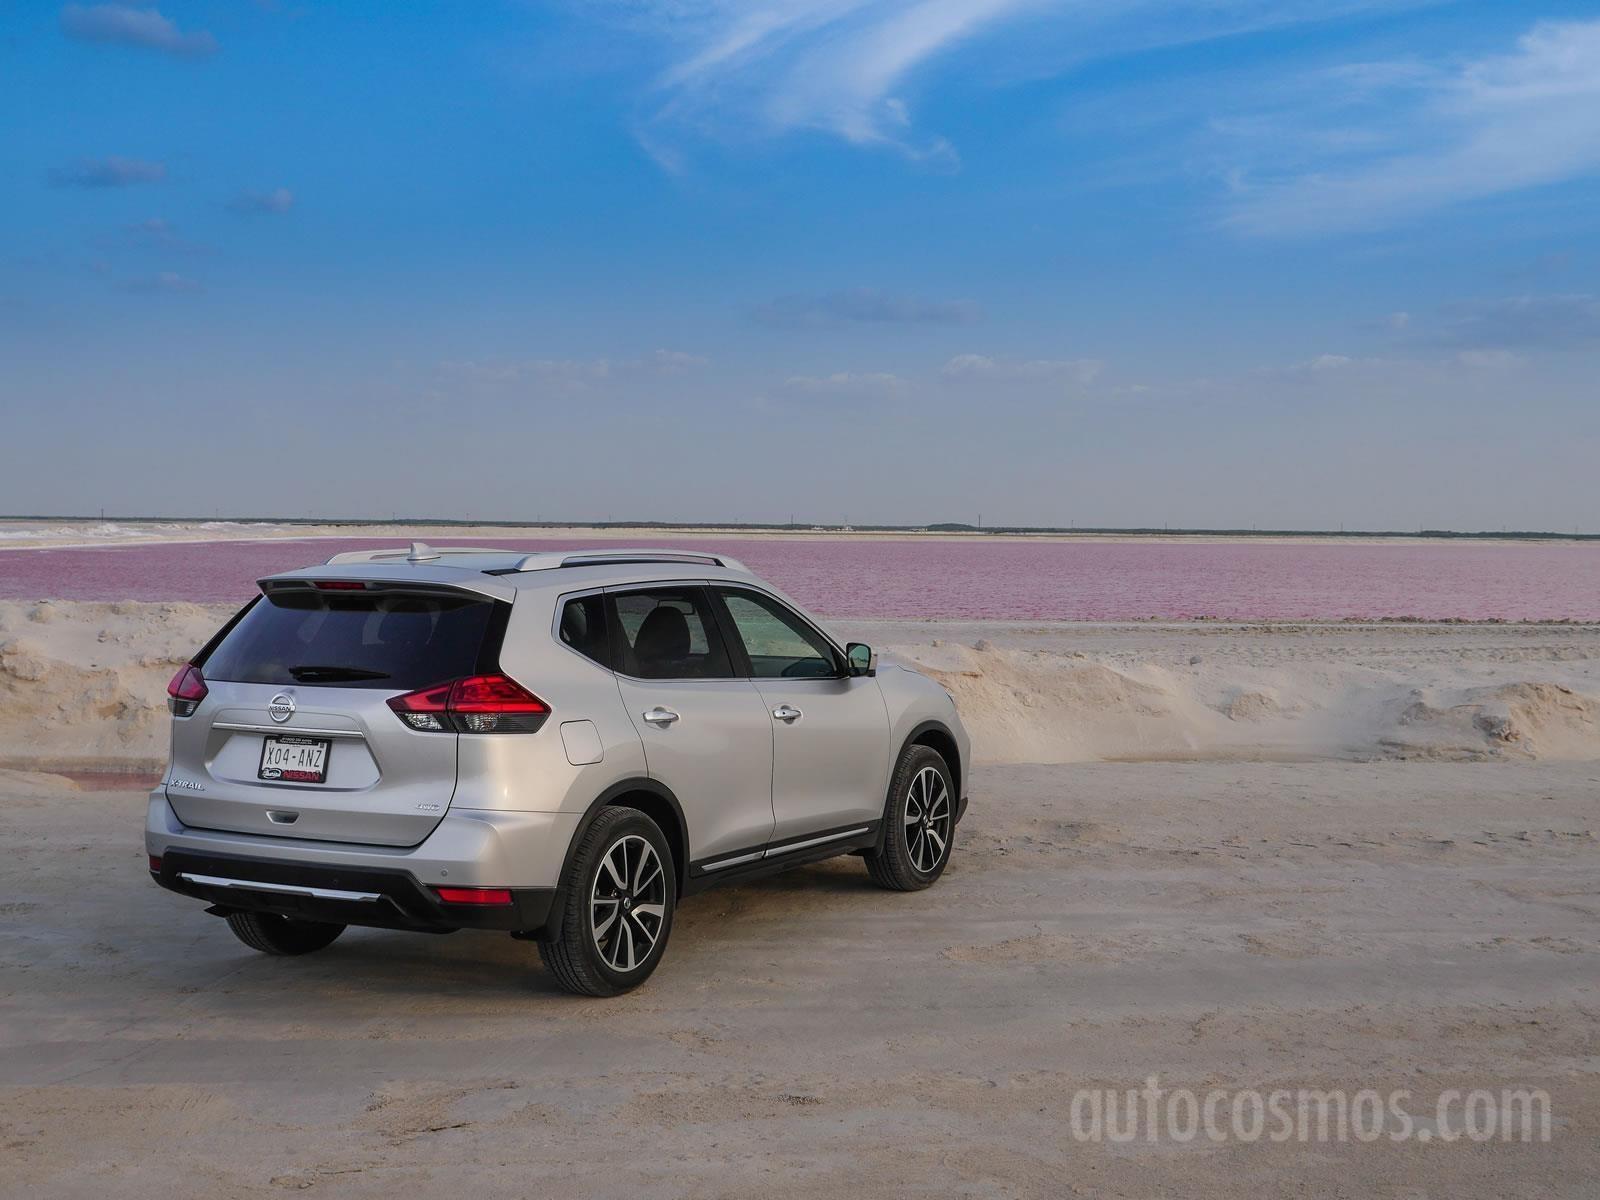 Nissan X-Trail 2018 a prueba - Autocosmos.com